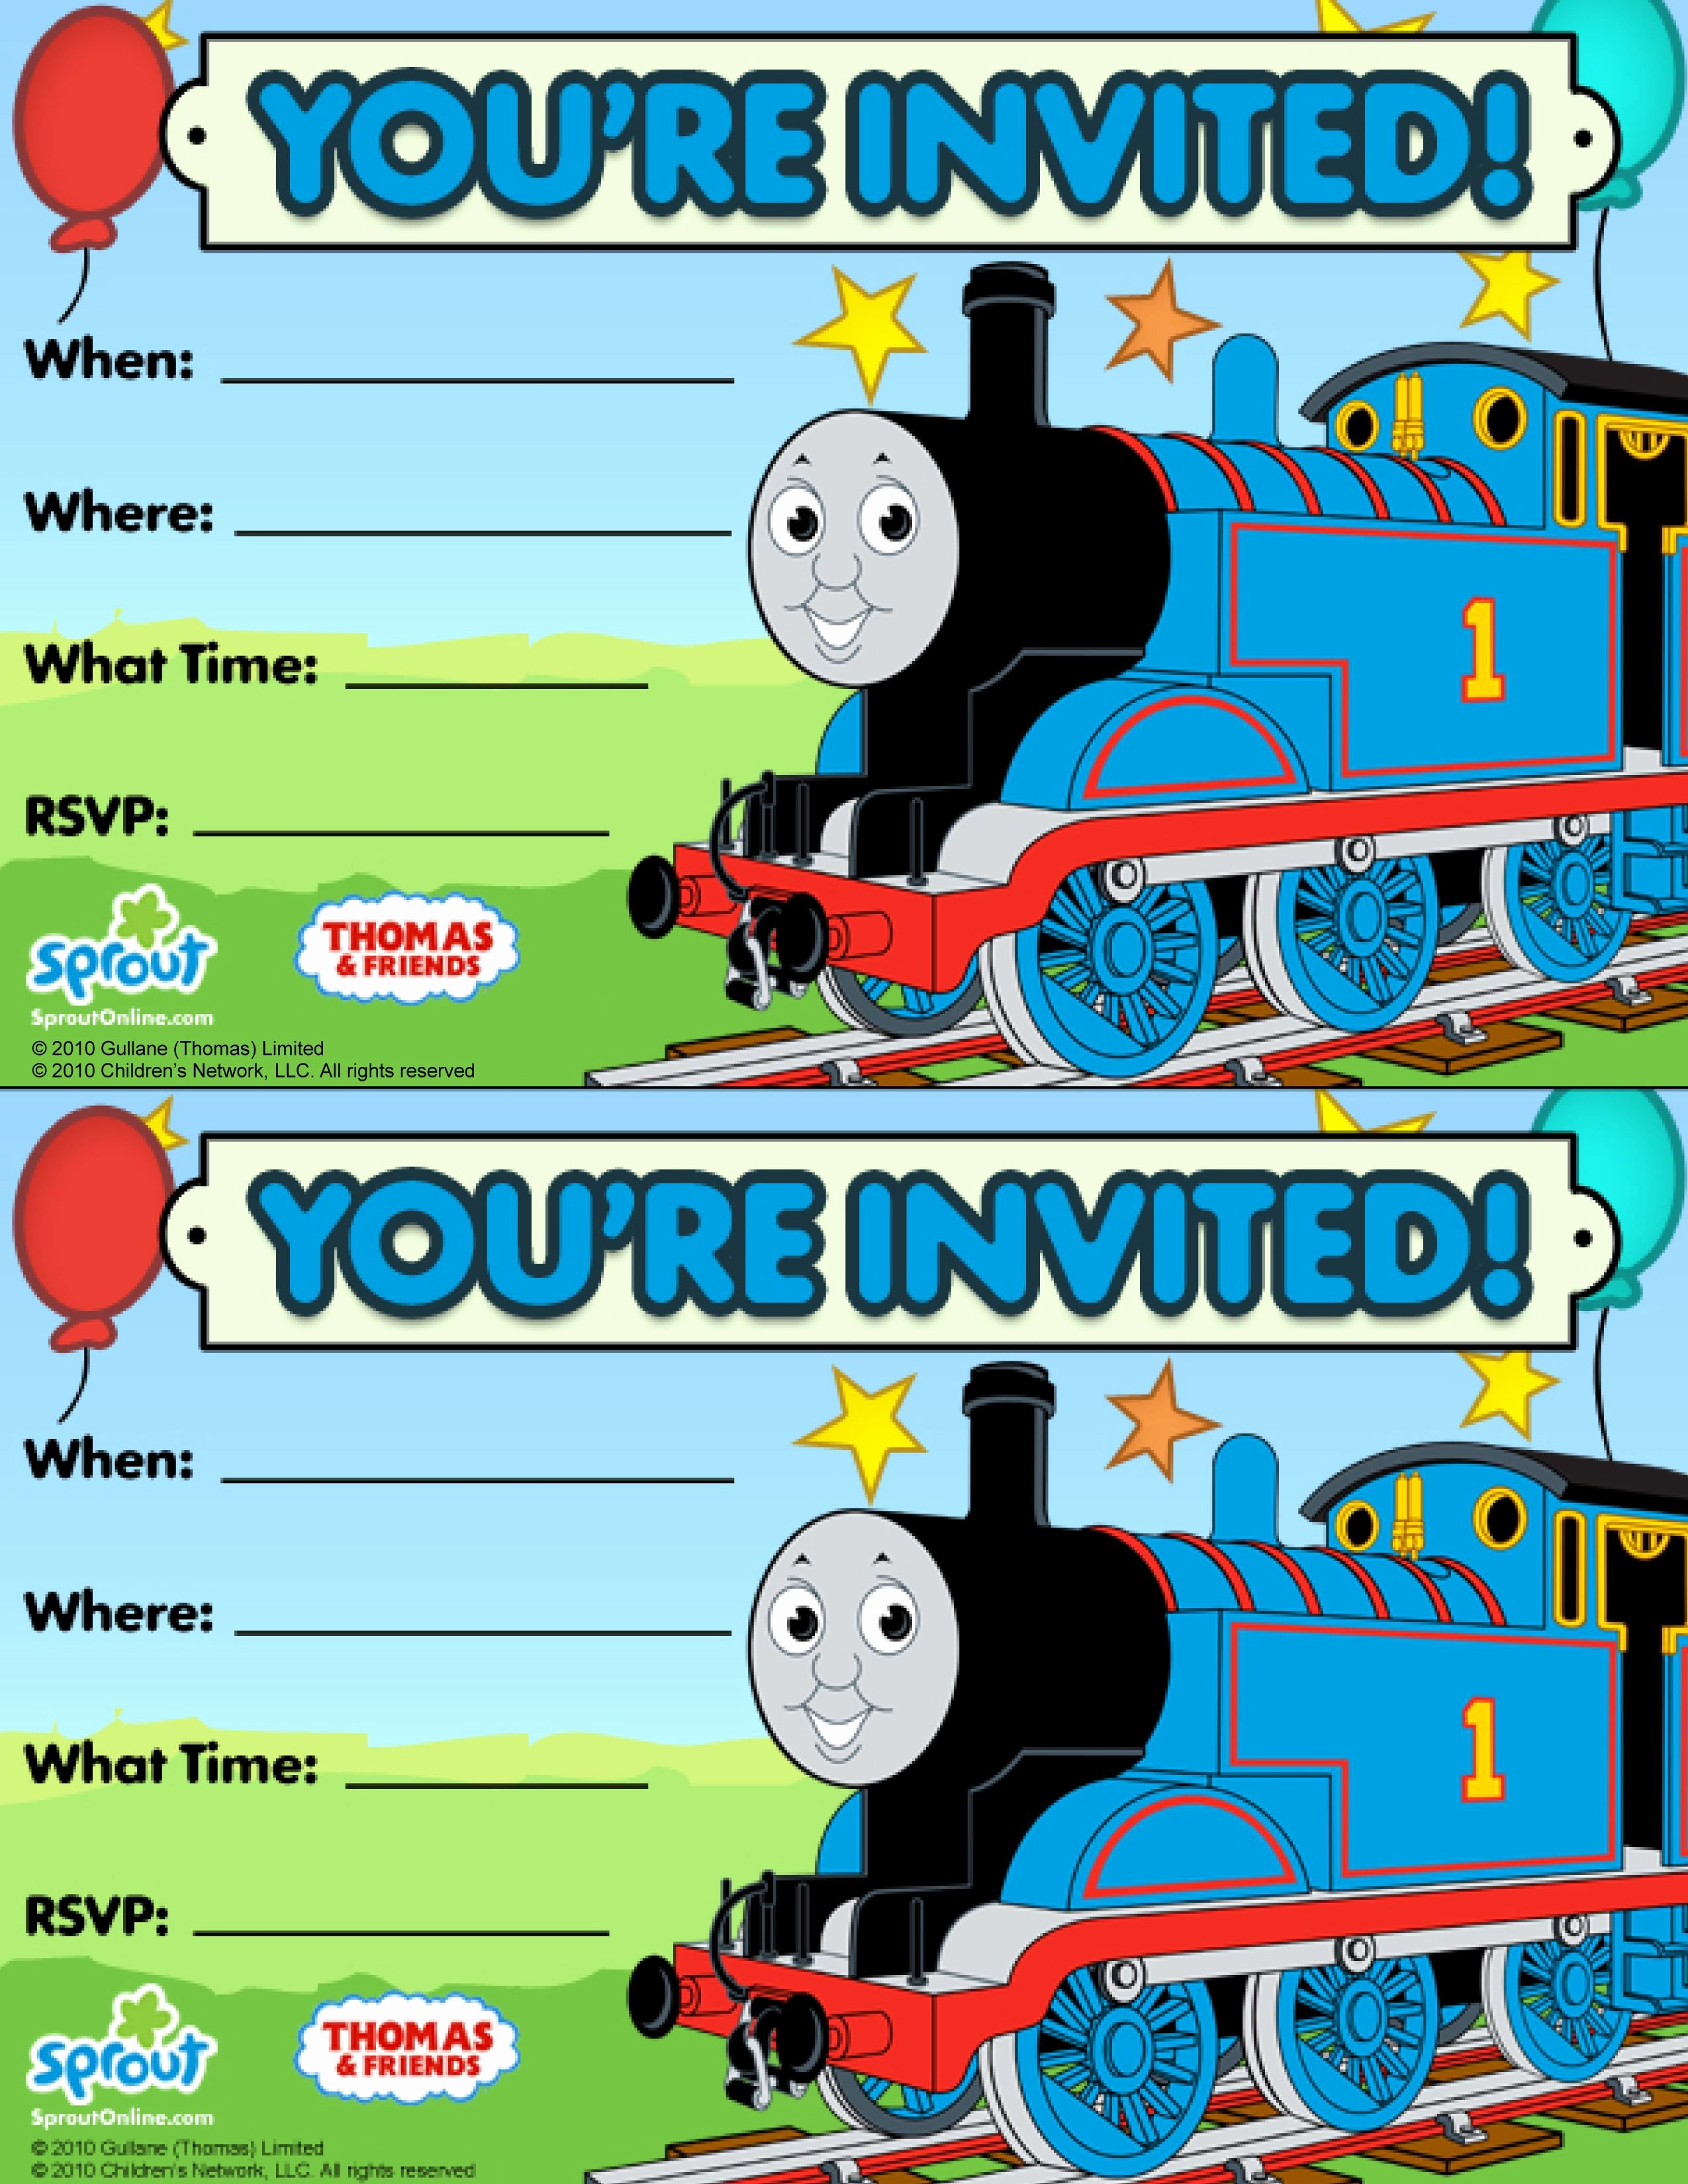 Thomas & Friends Party Invitation Free